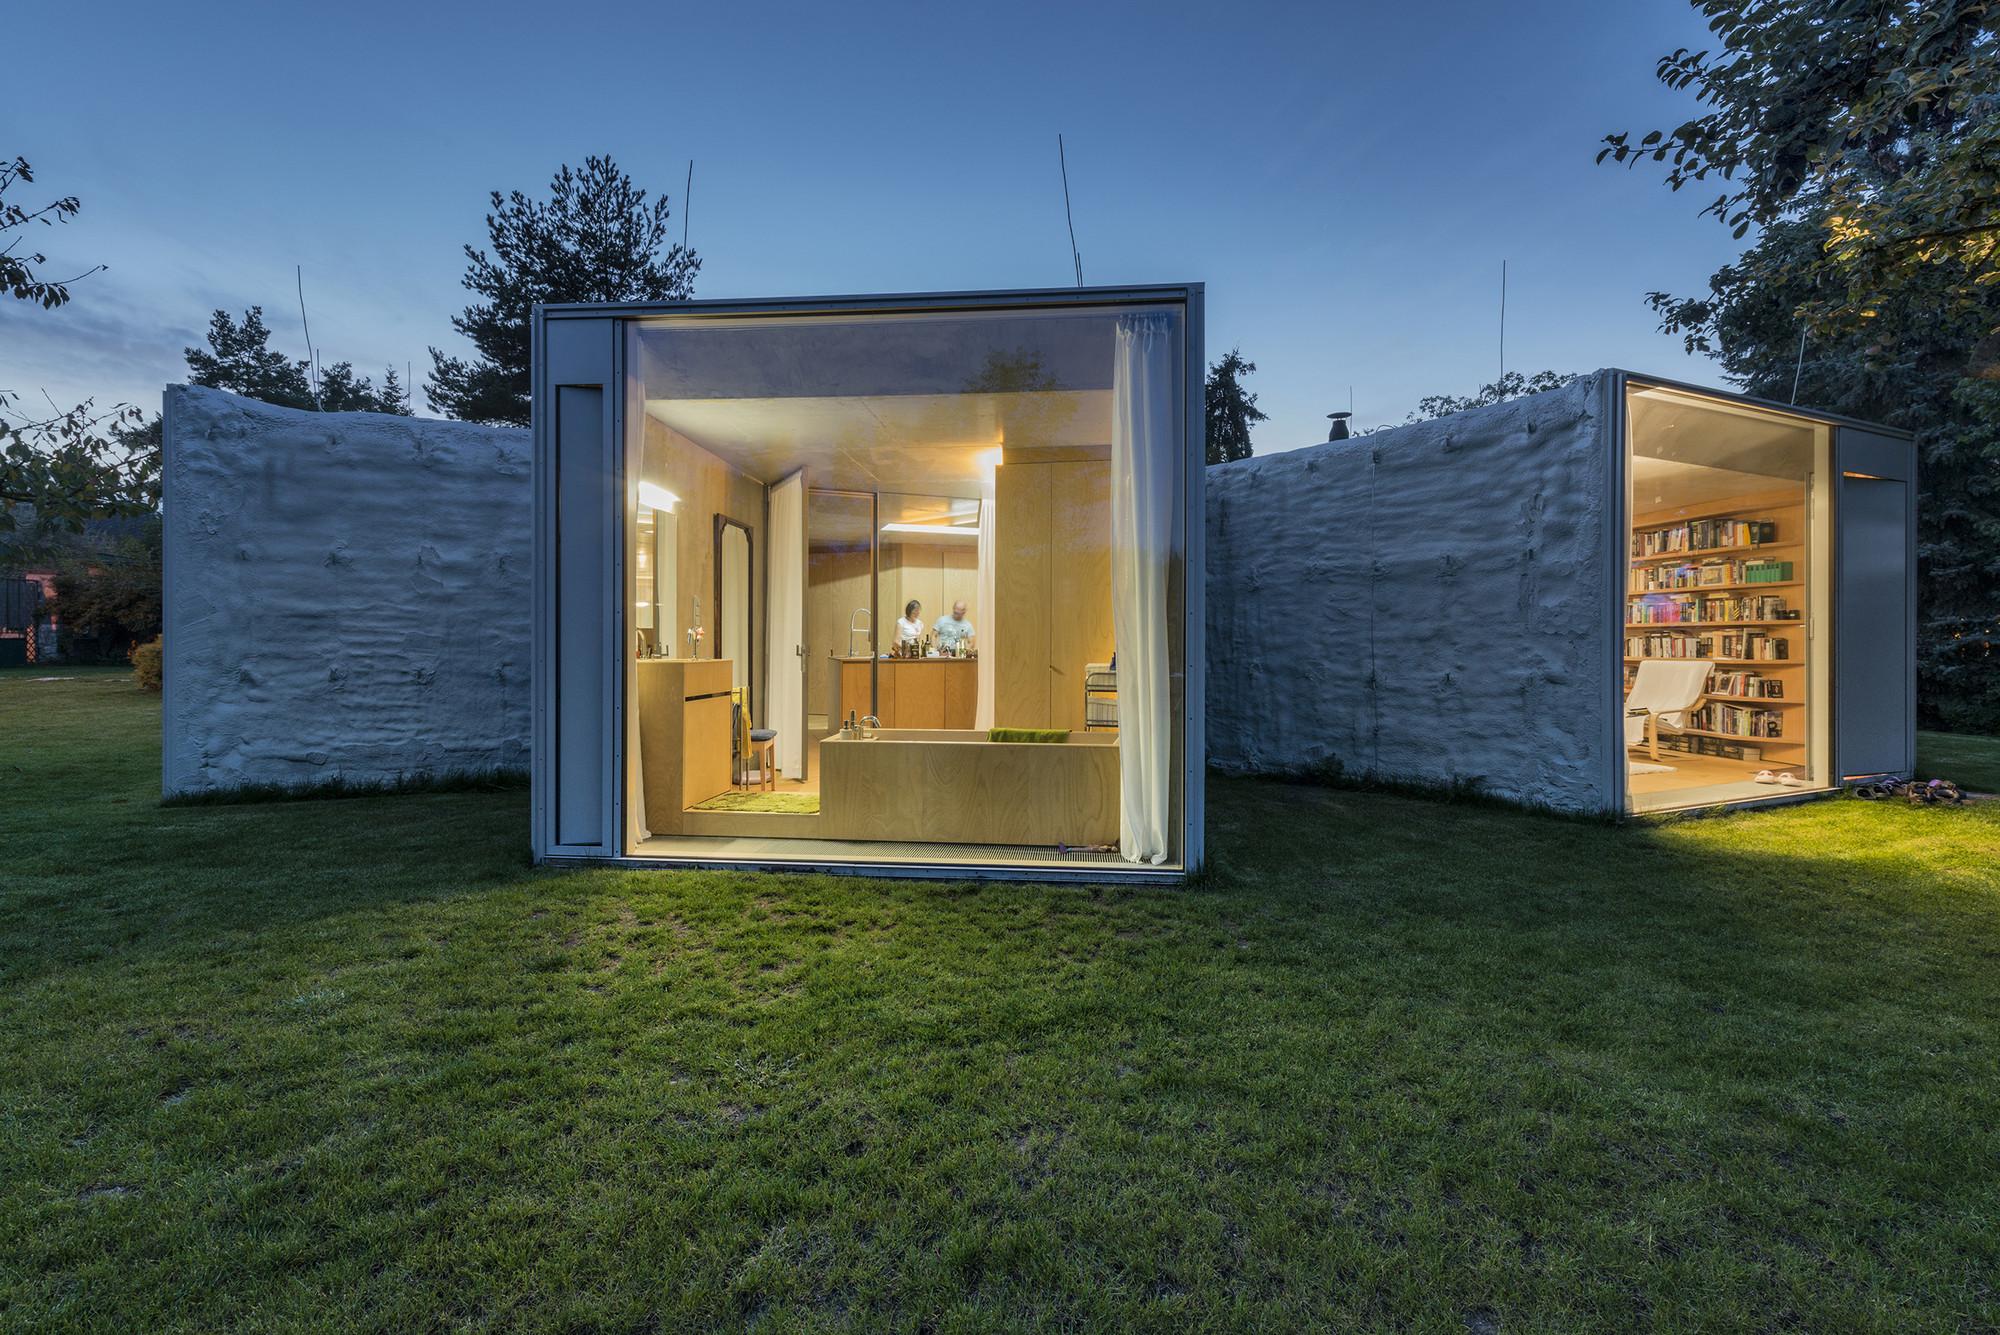 Chameleon House  / Petr Hajek Architekti, © Benedikt Markel